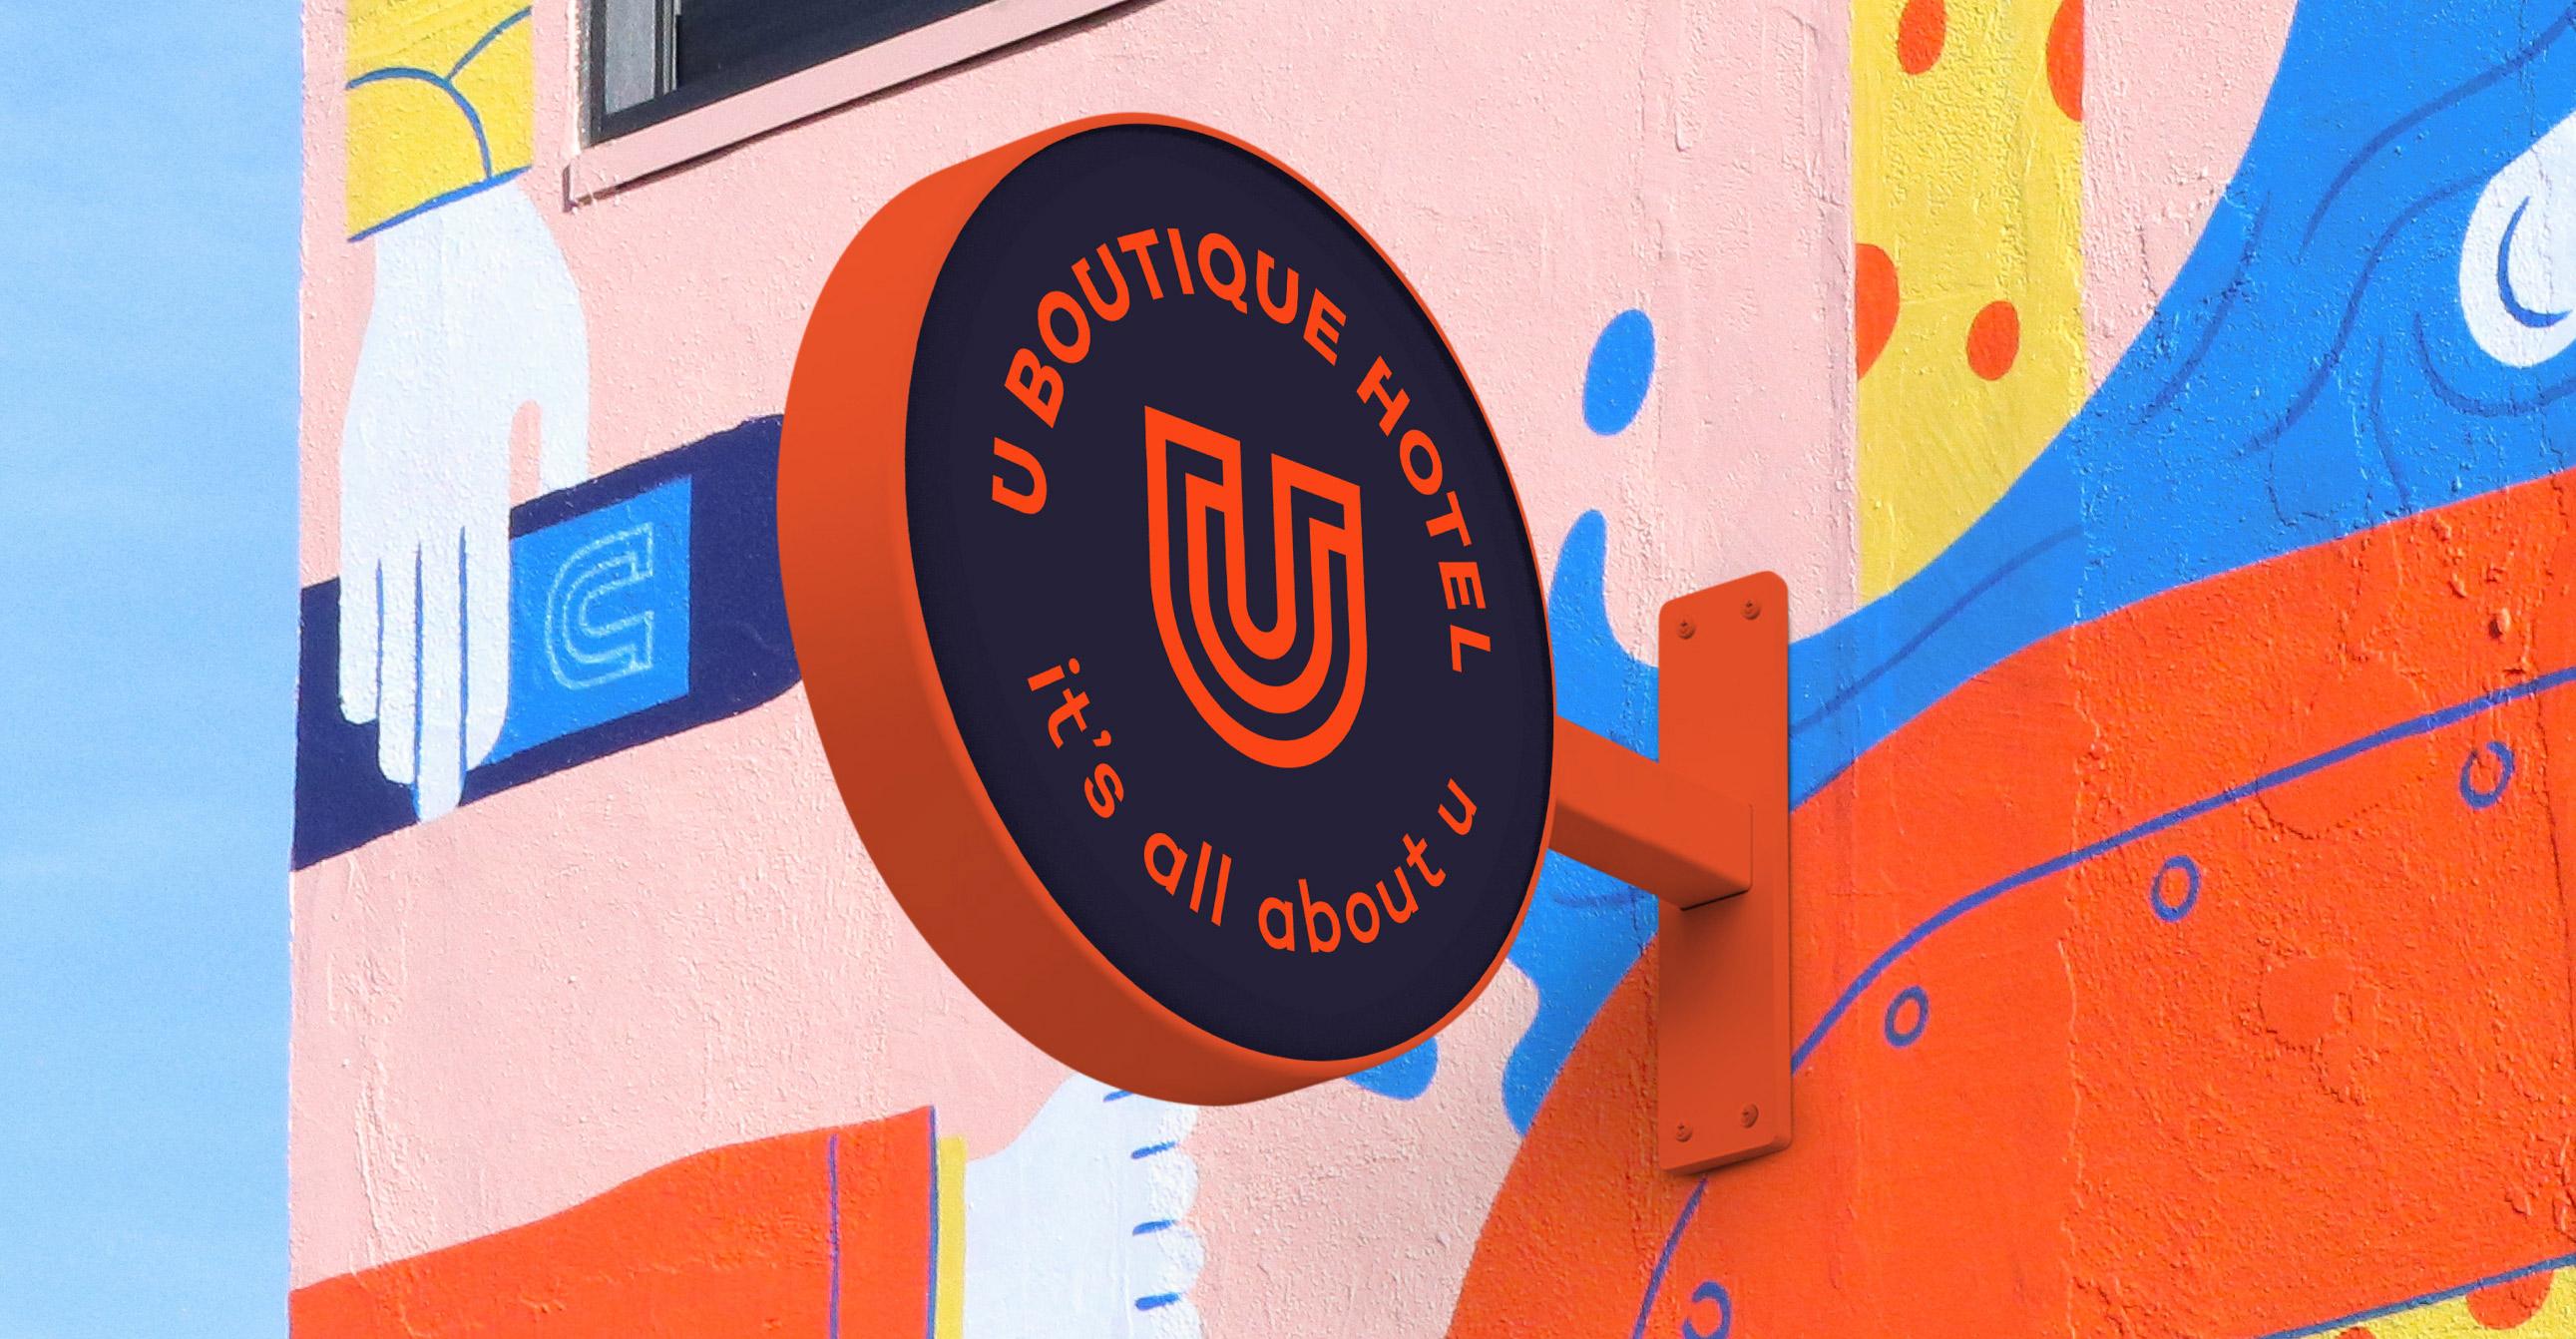 uboutique_08b.jpg